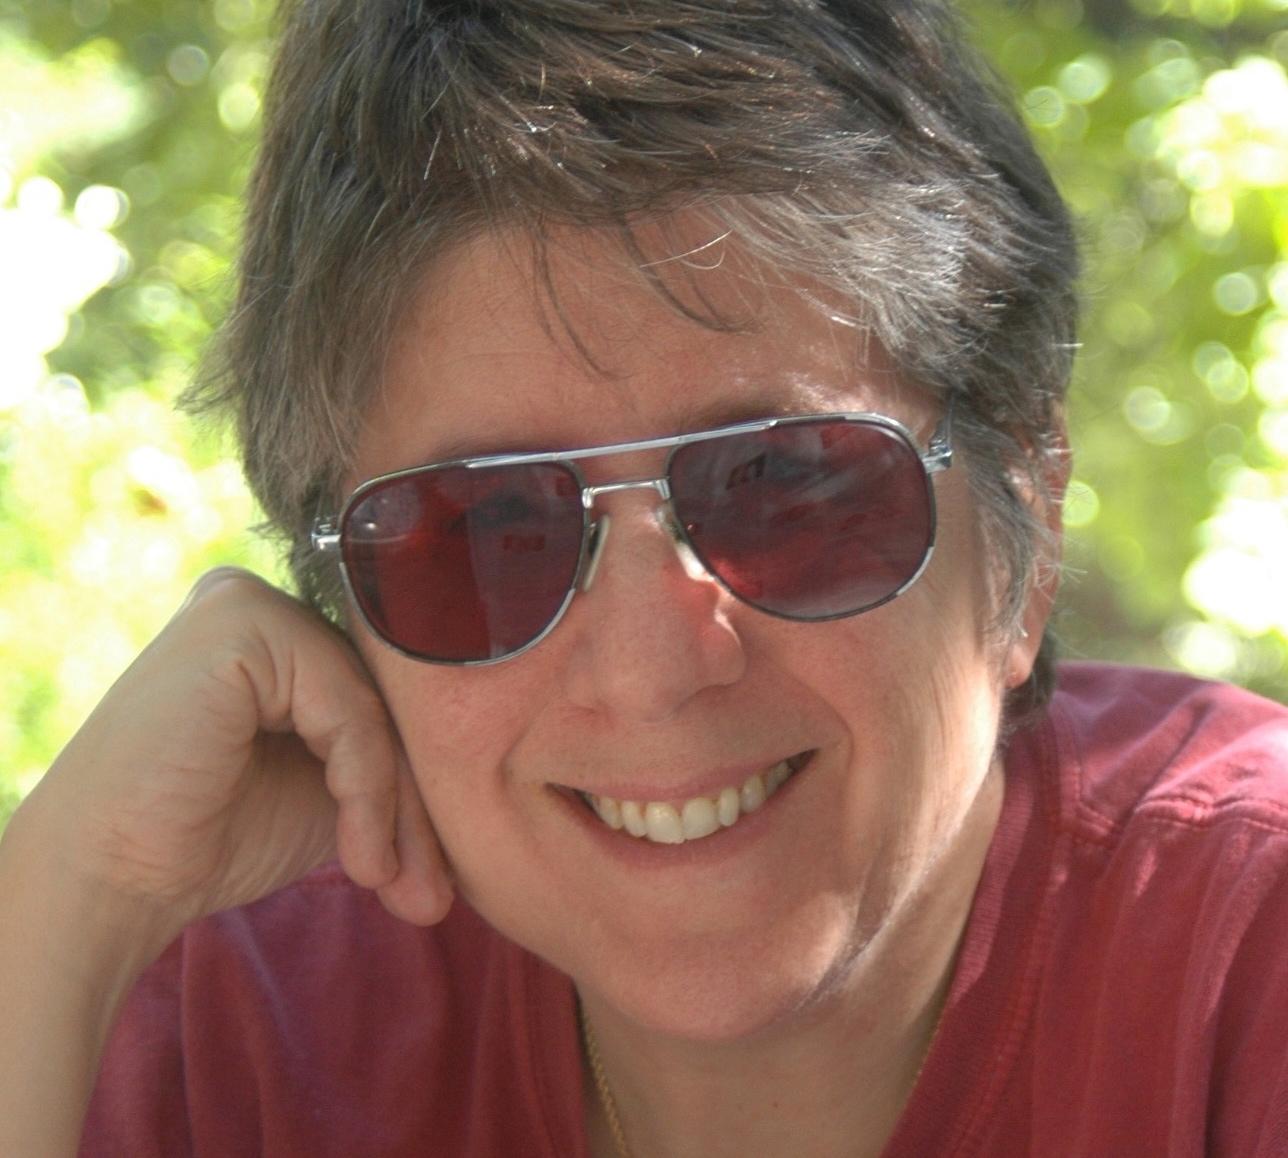 Gail Shister